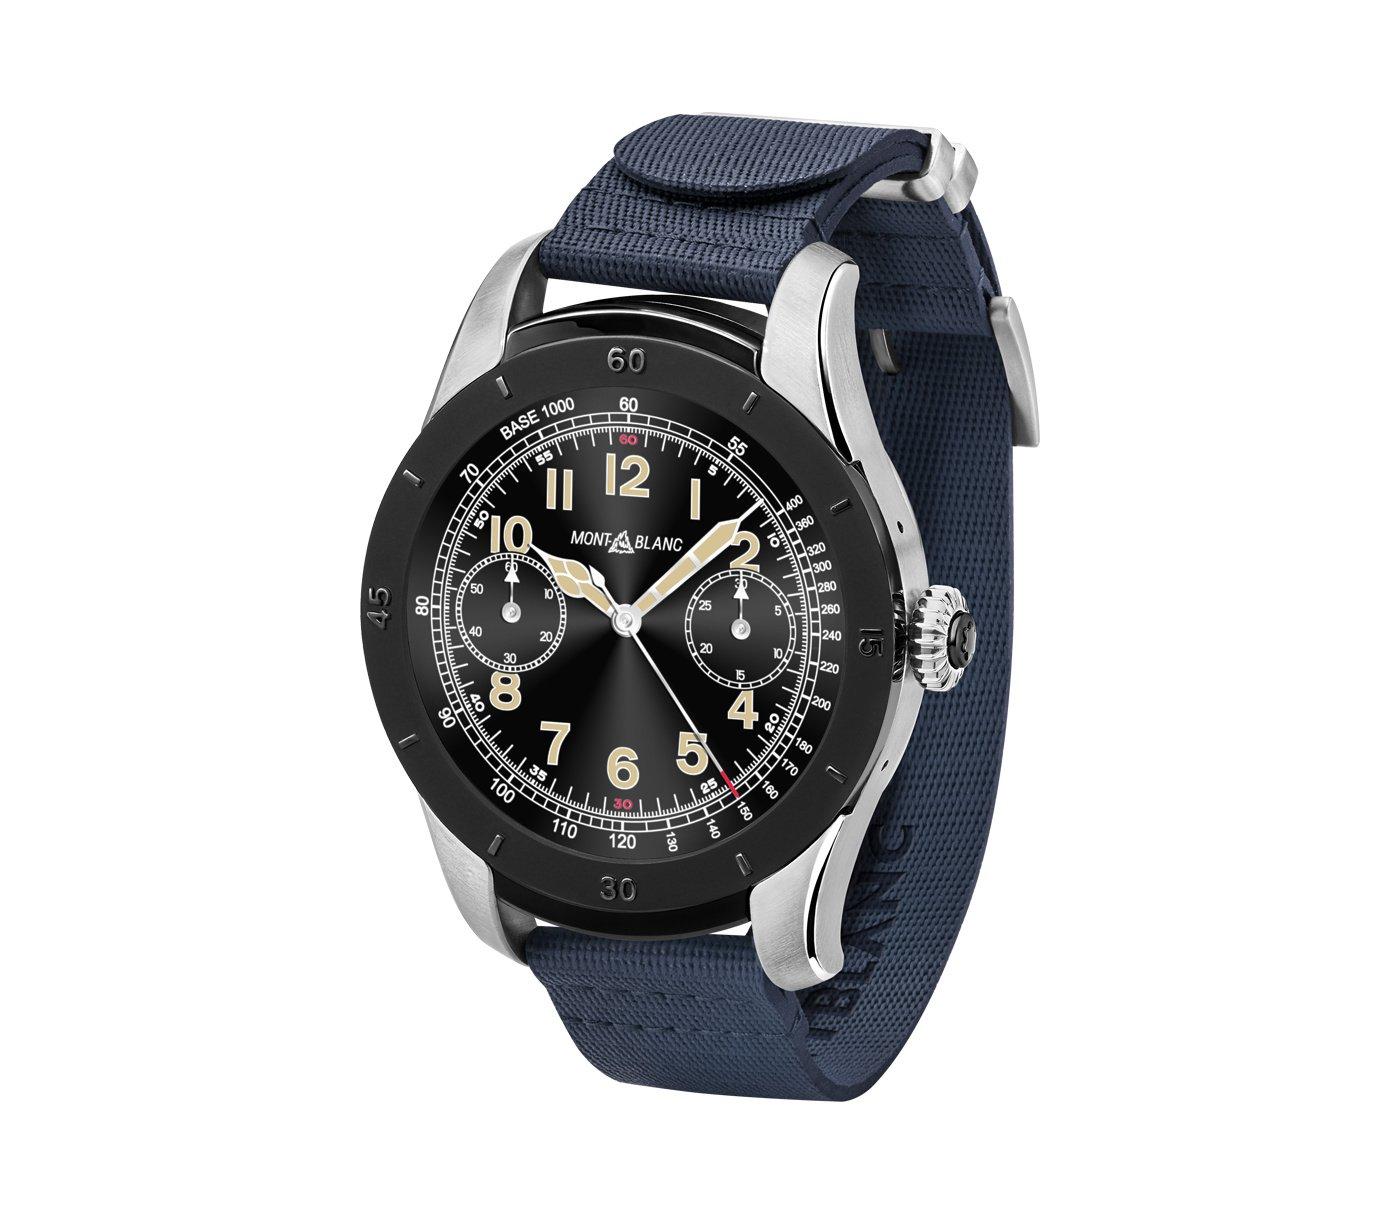 Amazon.com: Montblanc Summit Smartwatch – Bi-Color carcasa ...